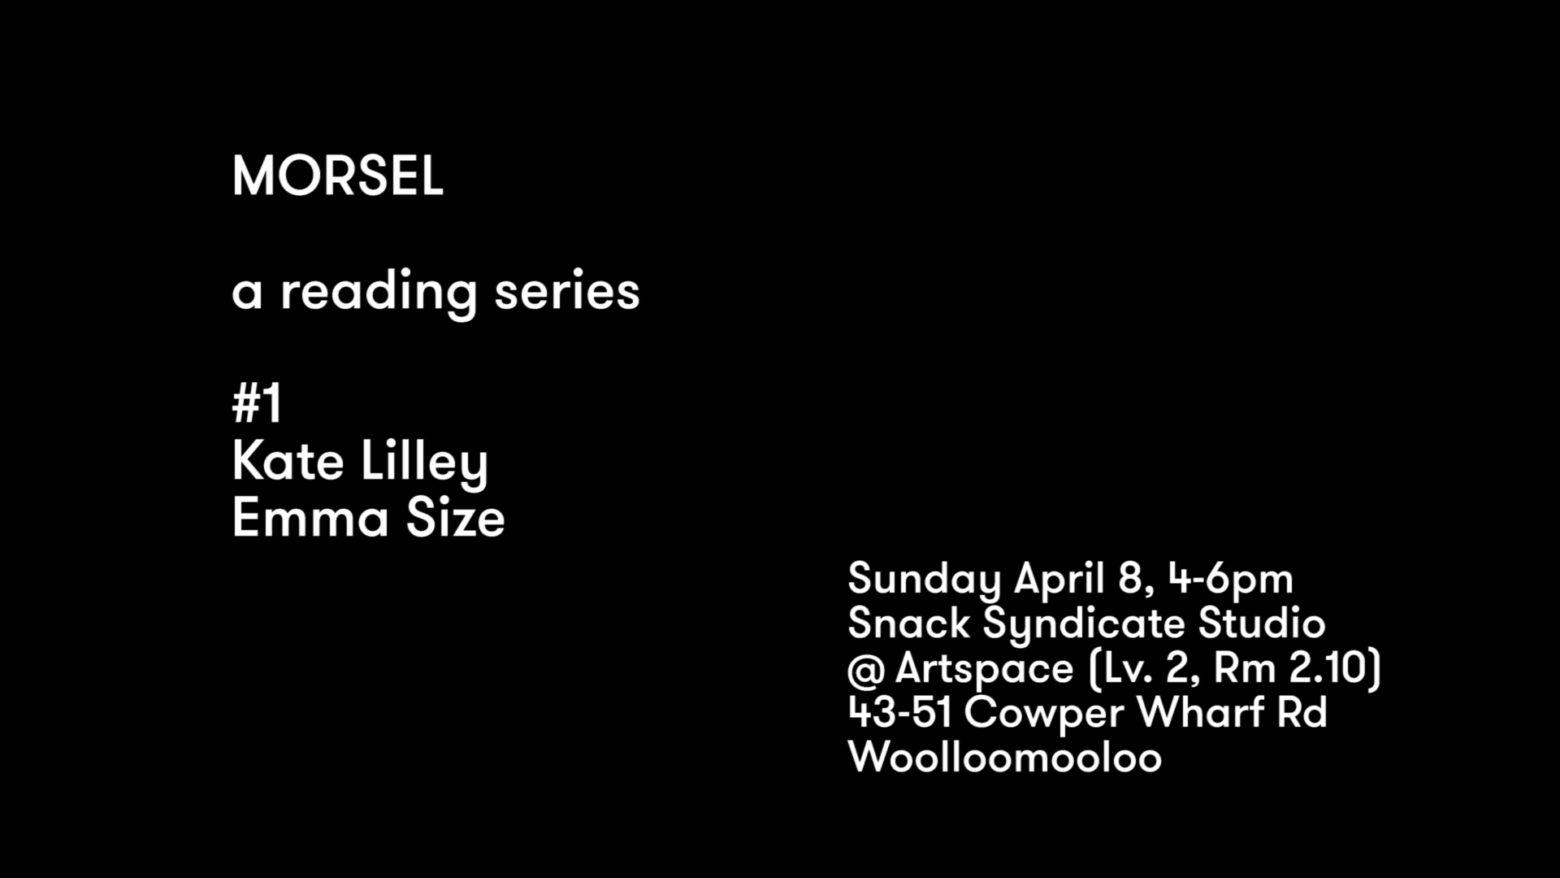 Morsel #1